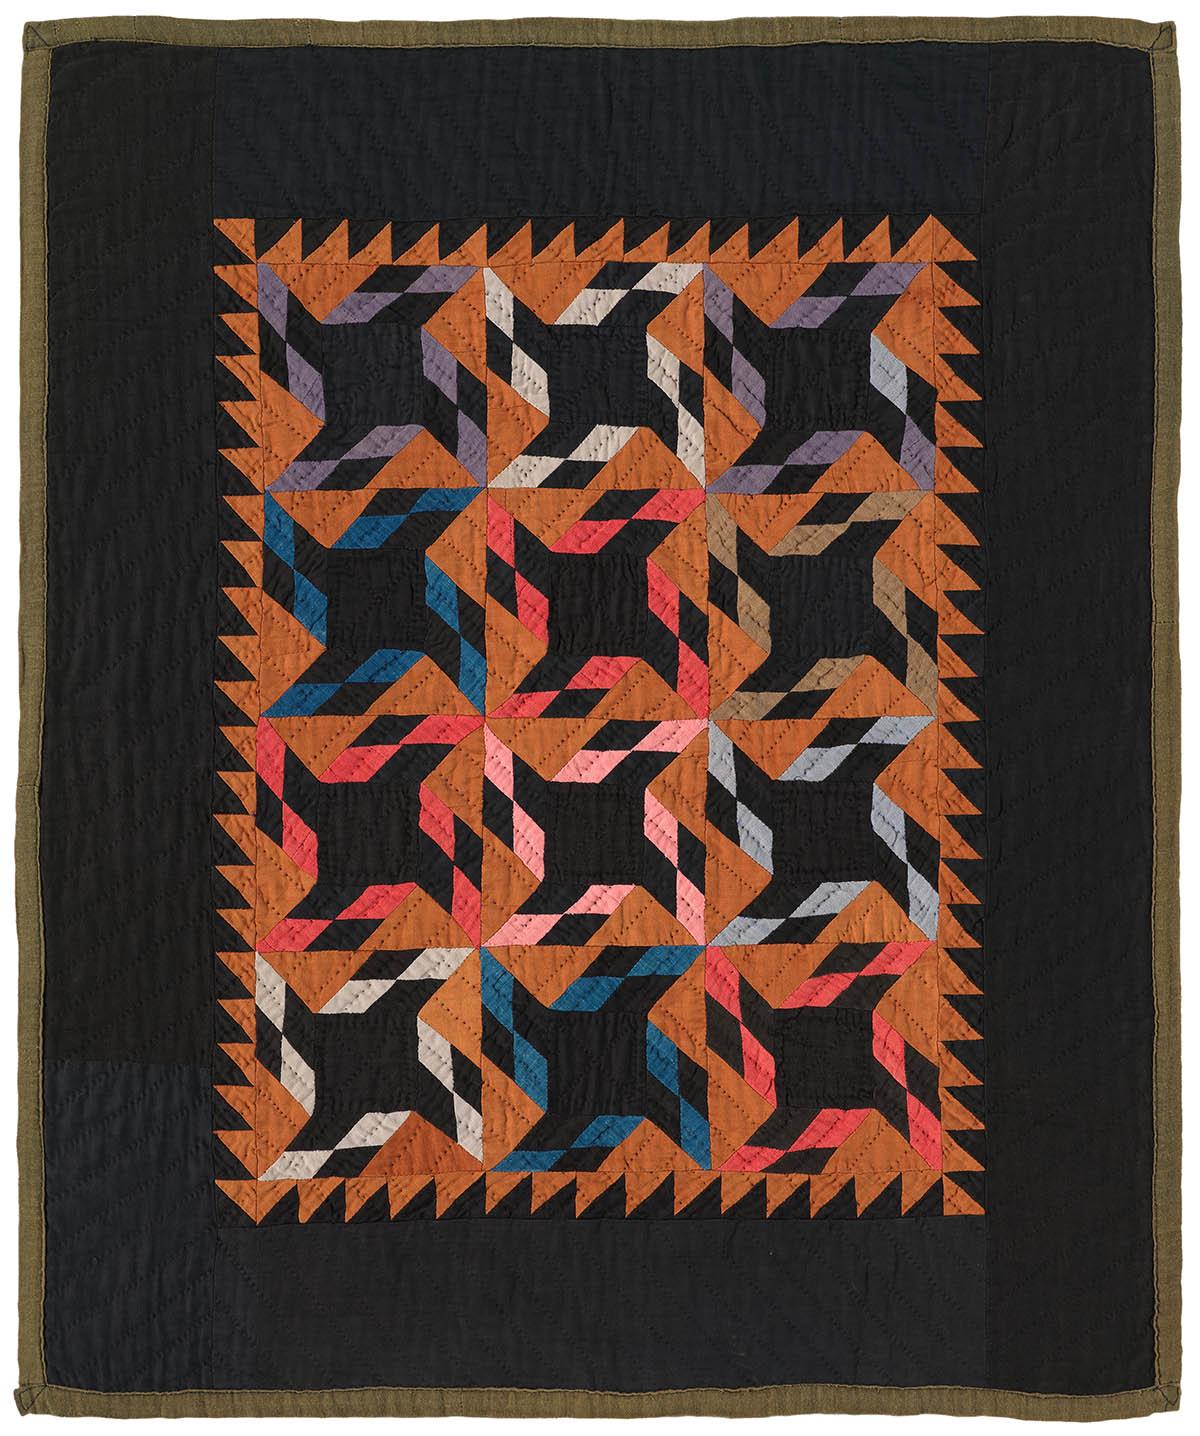 089: Original Pattern, Somerset County, PA c.1930  30x25